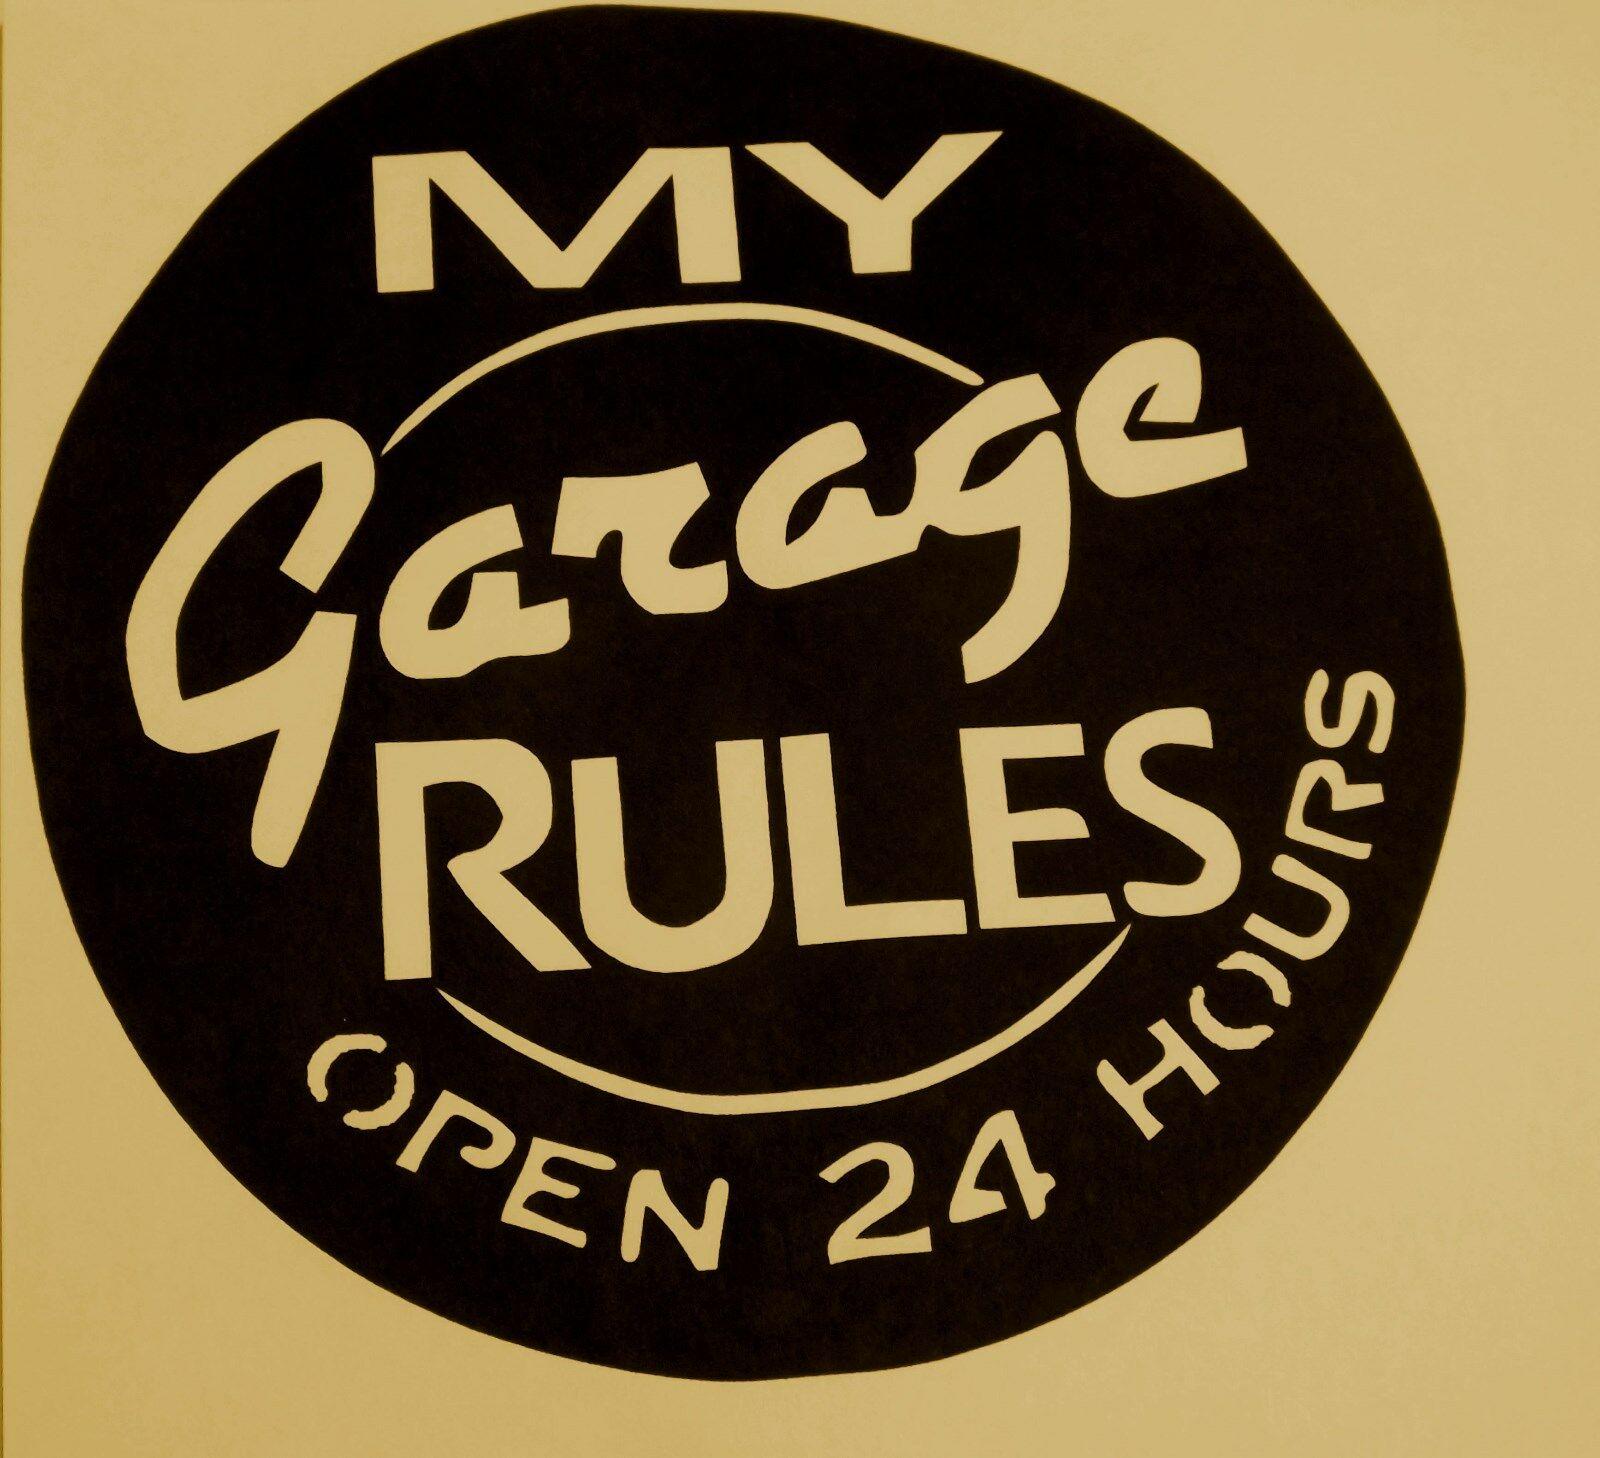 Garage sign for men,Dad,Metal Art,Man Cave,My Garage Rules,signage,wall Rules,signage,wall Rules,signage,wall decor c7a13b